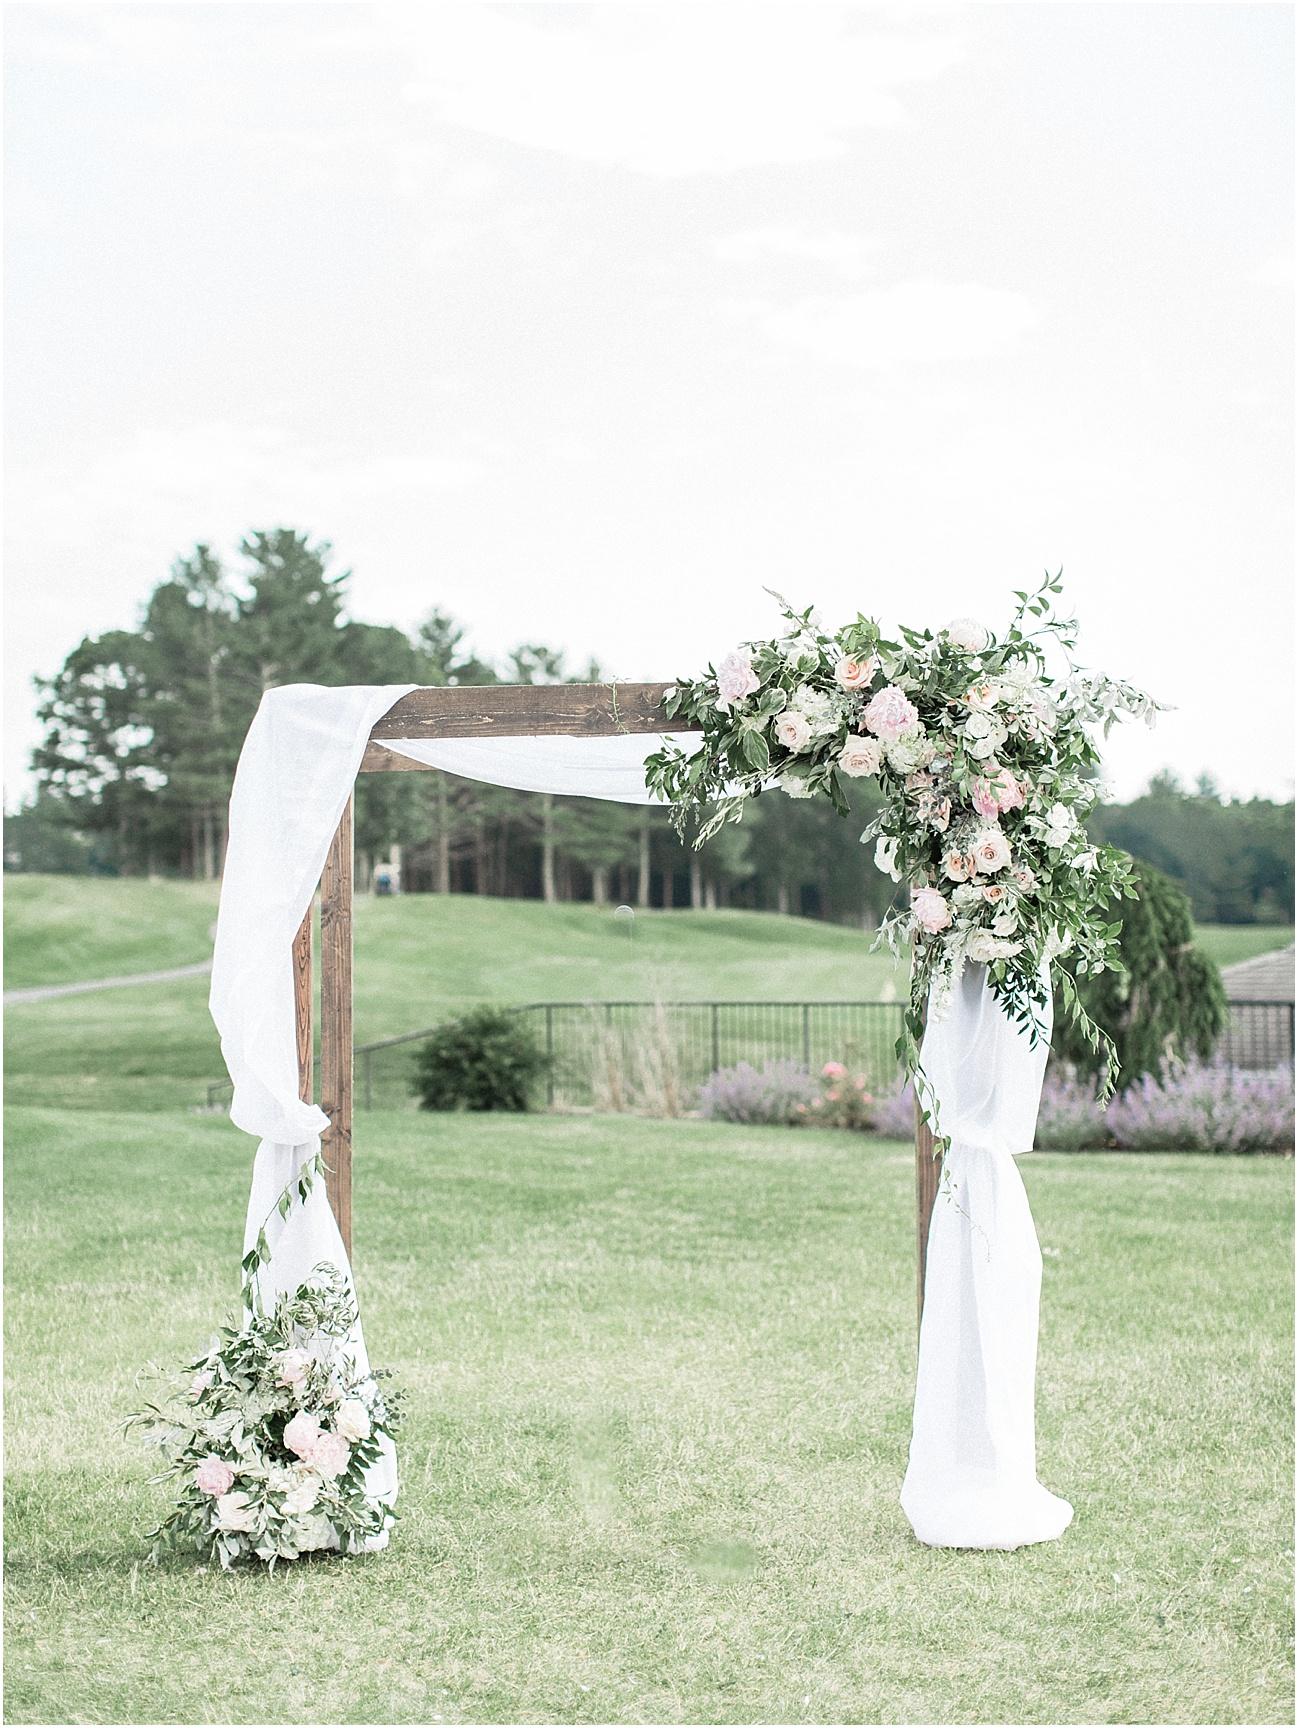 lindsey_paul_indian_pond_country_club_wild_dahlia_brewster_gardens_plymouth_cape_cod_boston_wedding_photographer_meredith_jane_photography_photo_0387.jpg